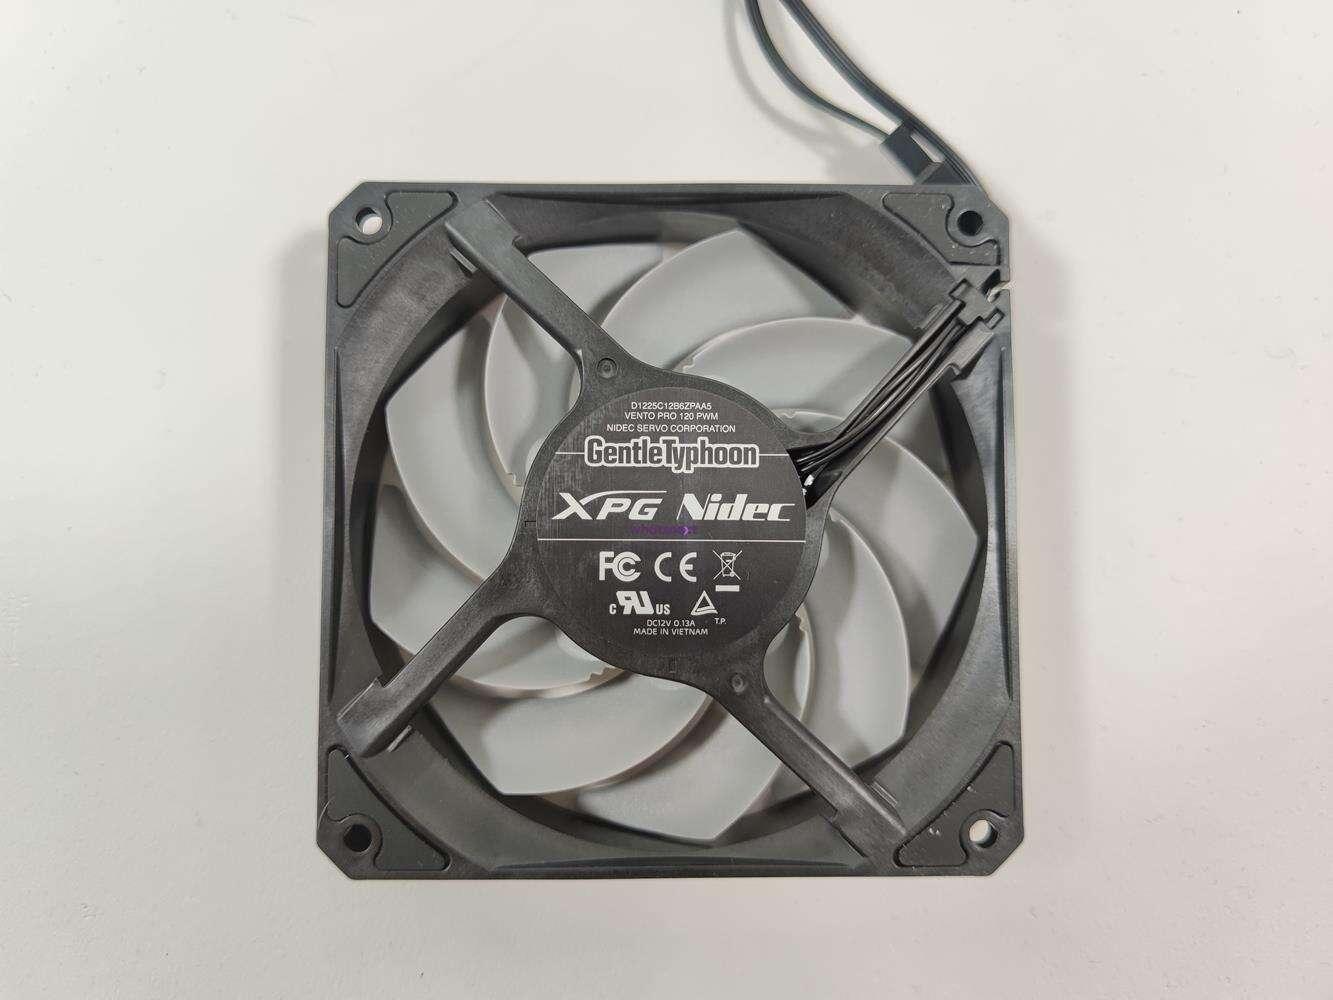 test XPG Vento Pro 120 PWM, recenzja XPG Vento Pro 120 PWM, opinia XPG Vento Pro 120 PWM